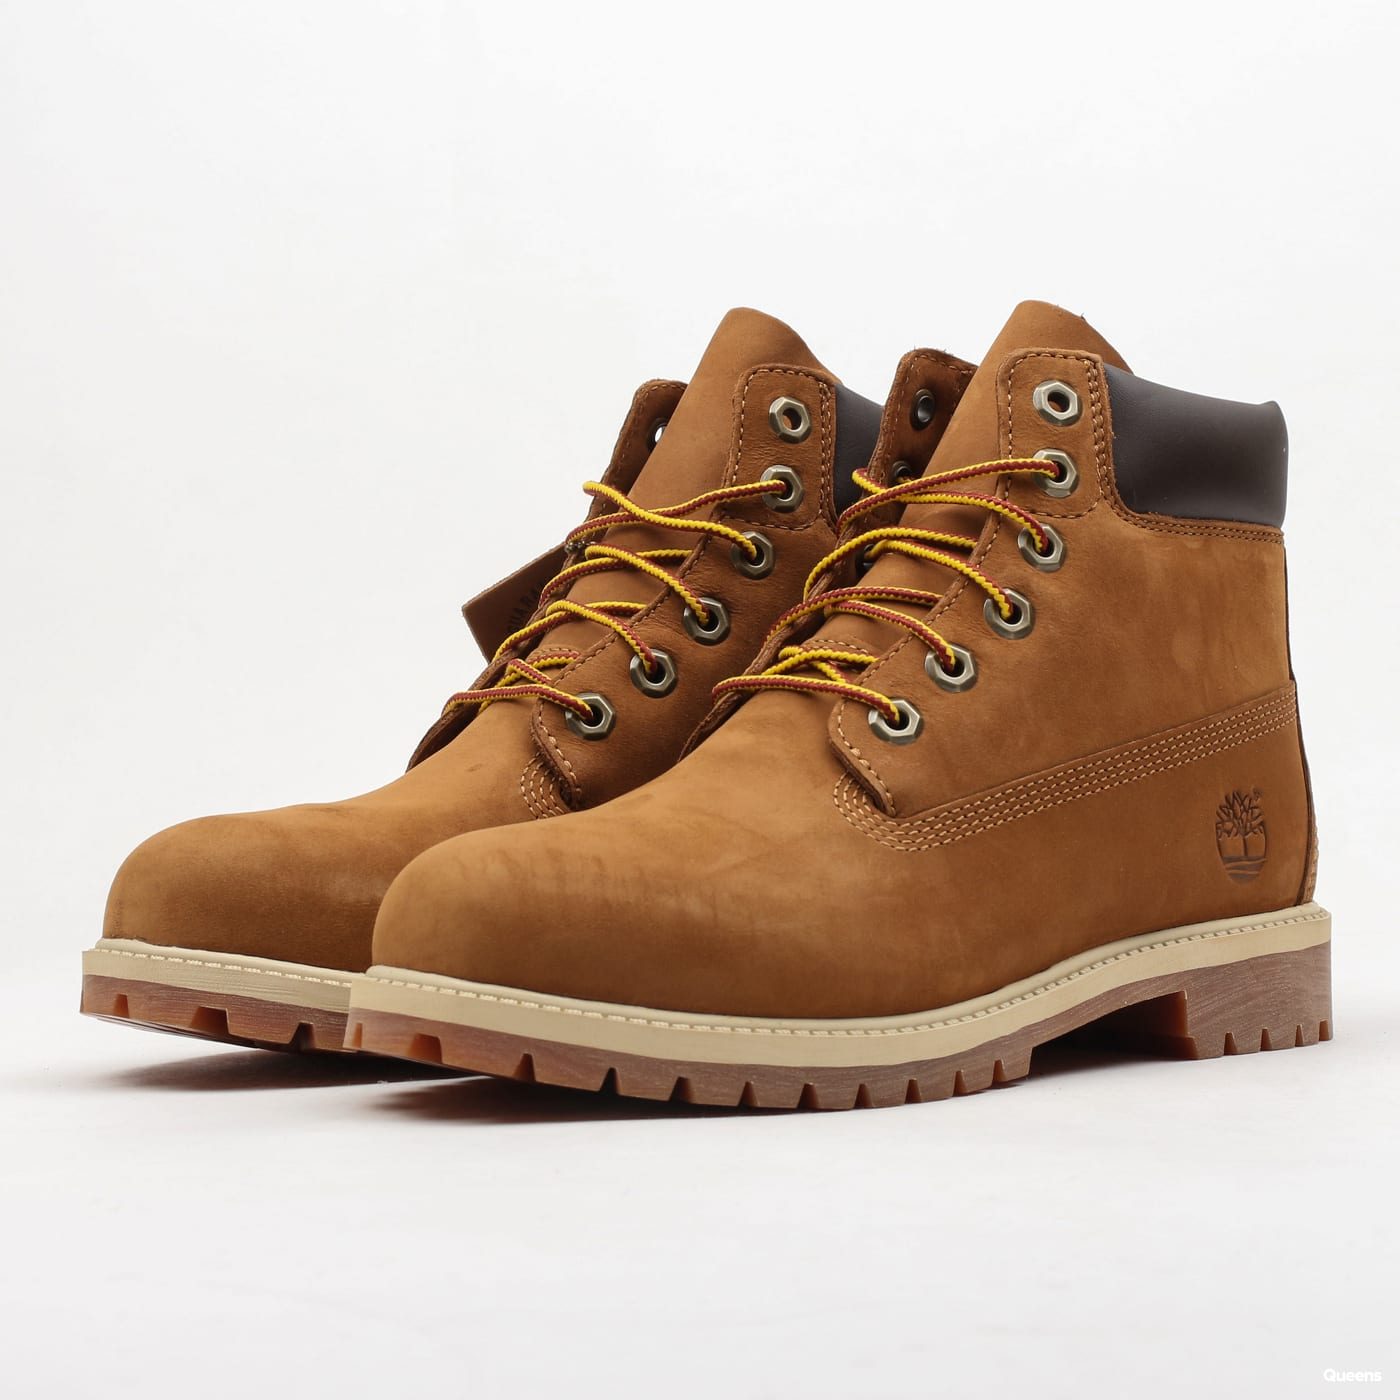 c8b0527f2d2 Pánské zimní boty Timberland 6 Inch Premium Boot (14949) – Queens 💚